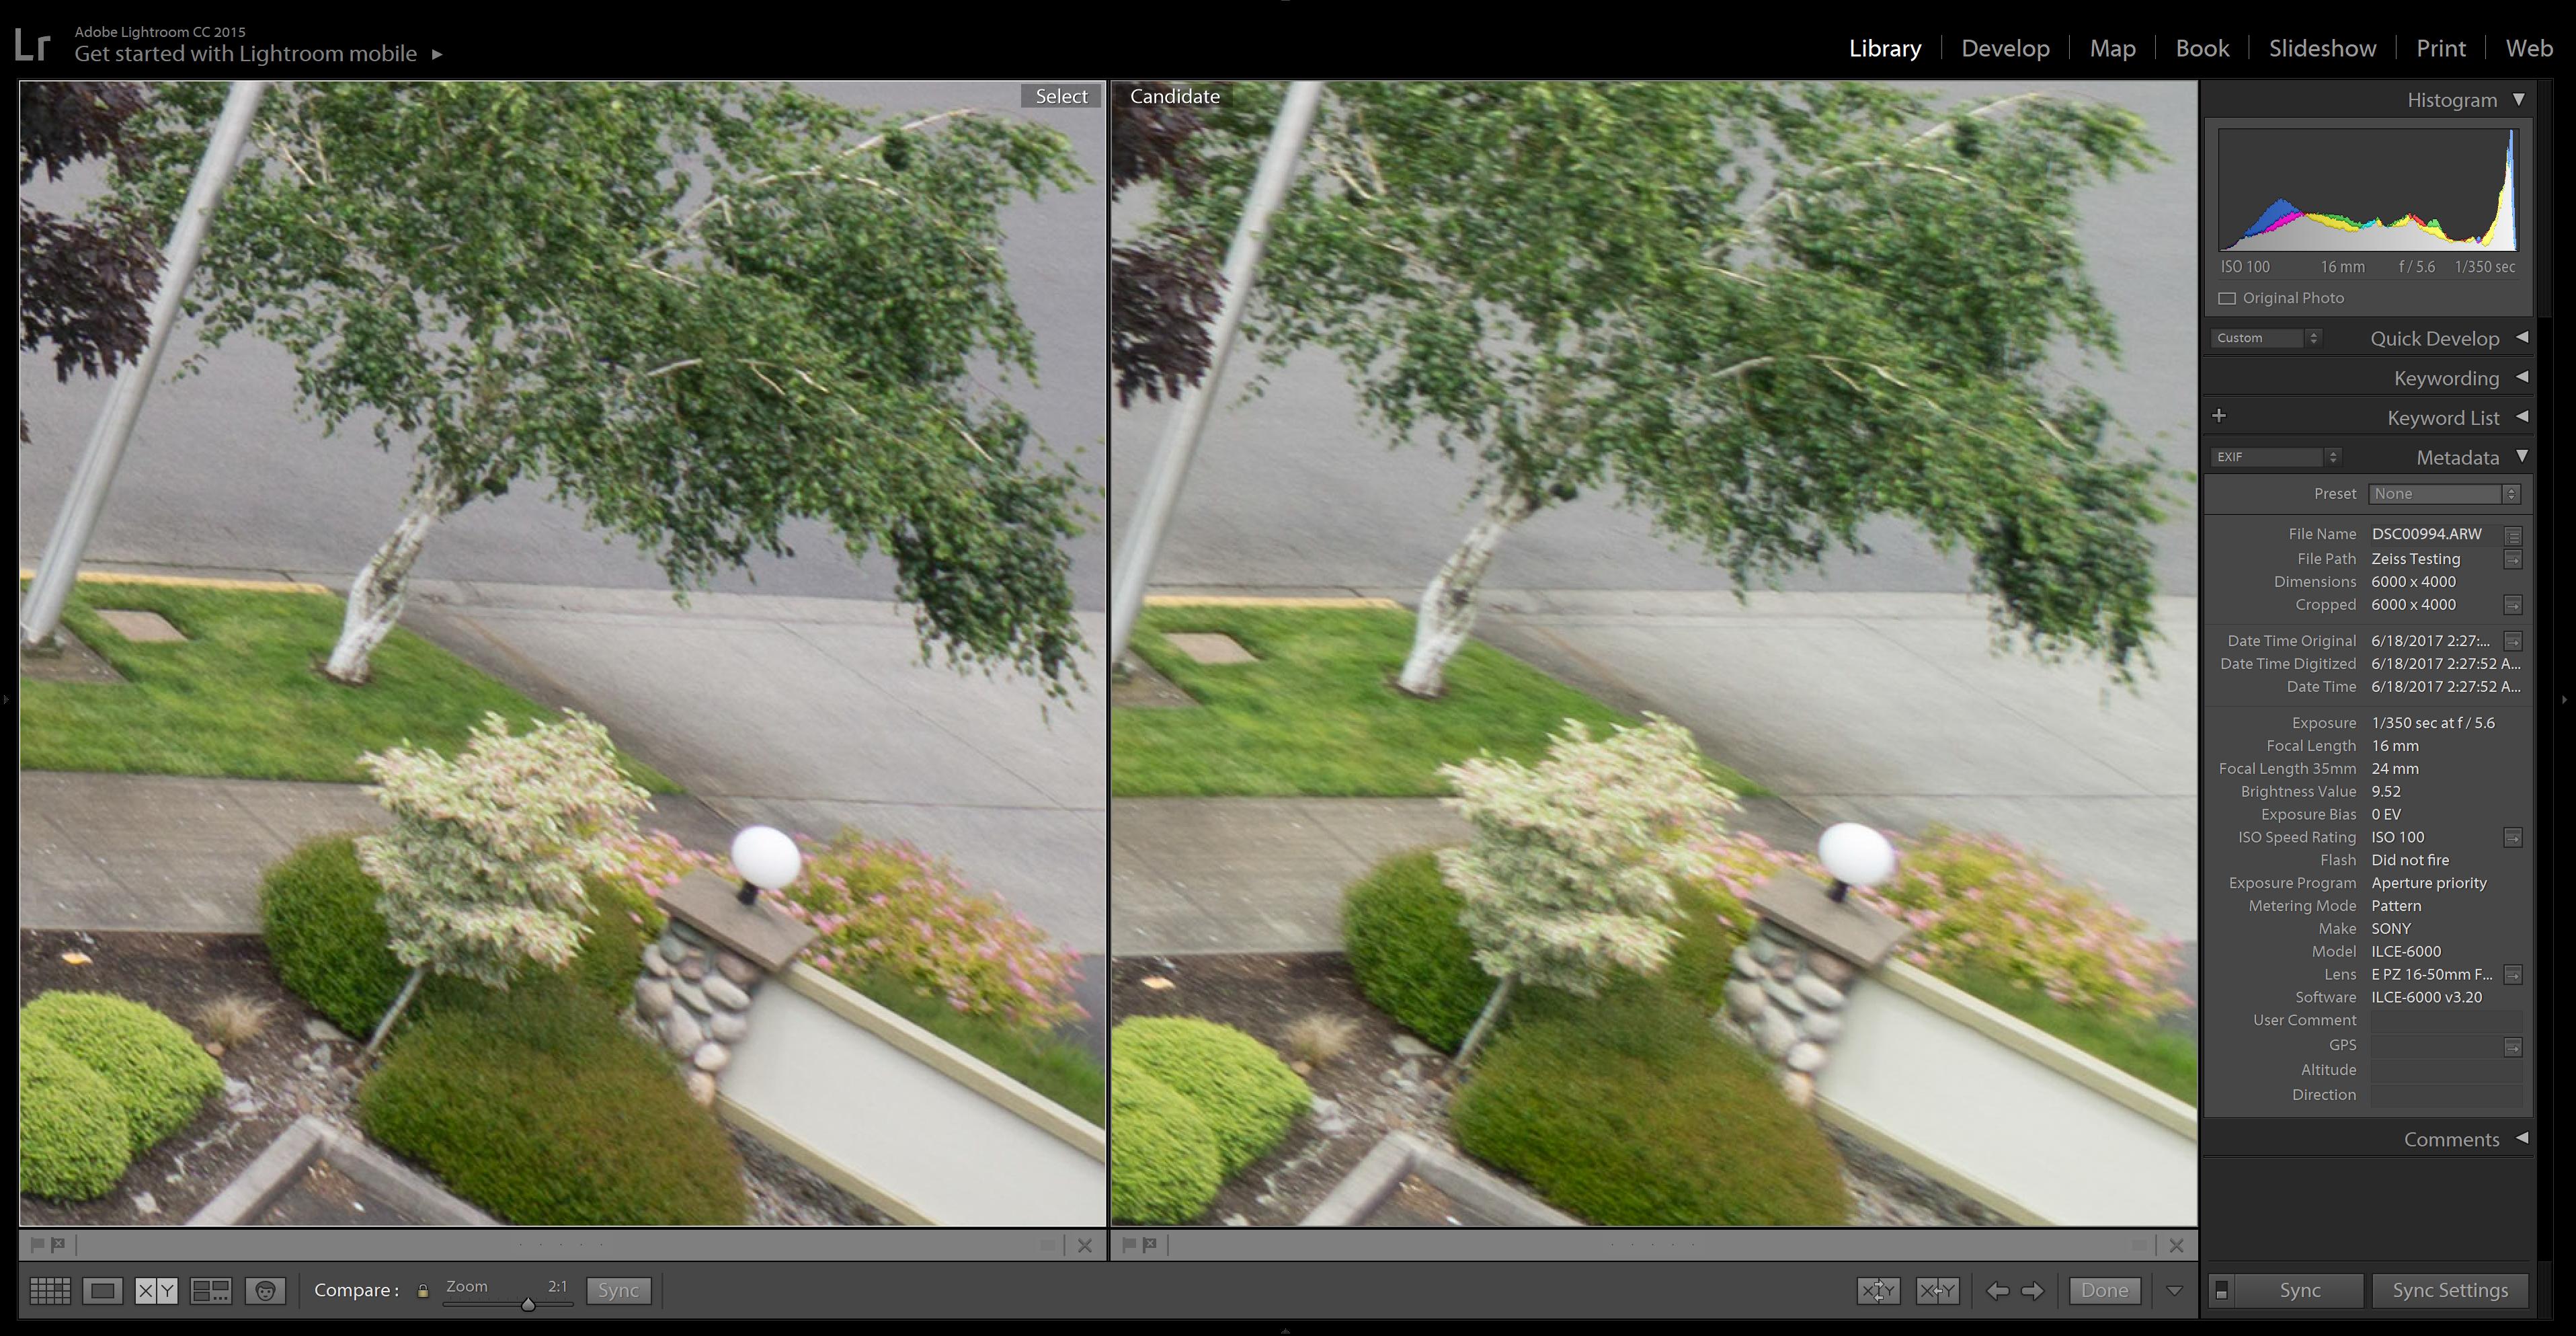 Sony Vs Fuji Apsc Standard Zooms Alpha Nex E Mount Aps C Fujifilm Mirrorless Camera X T20 1650 Bk View Original Size